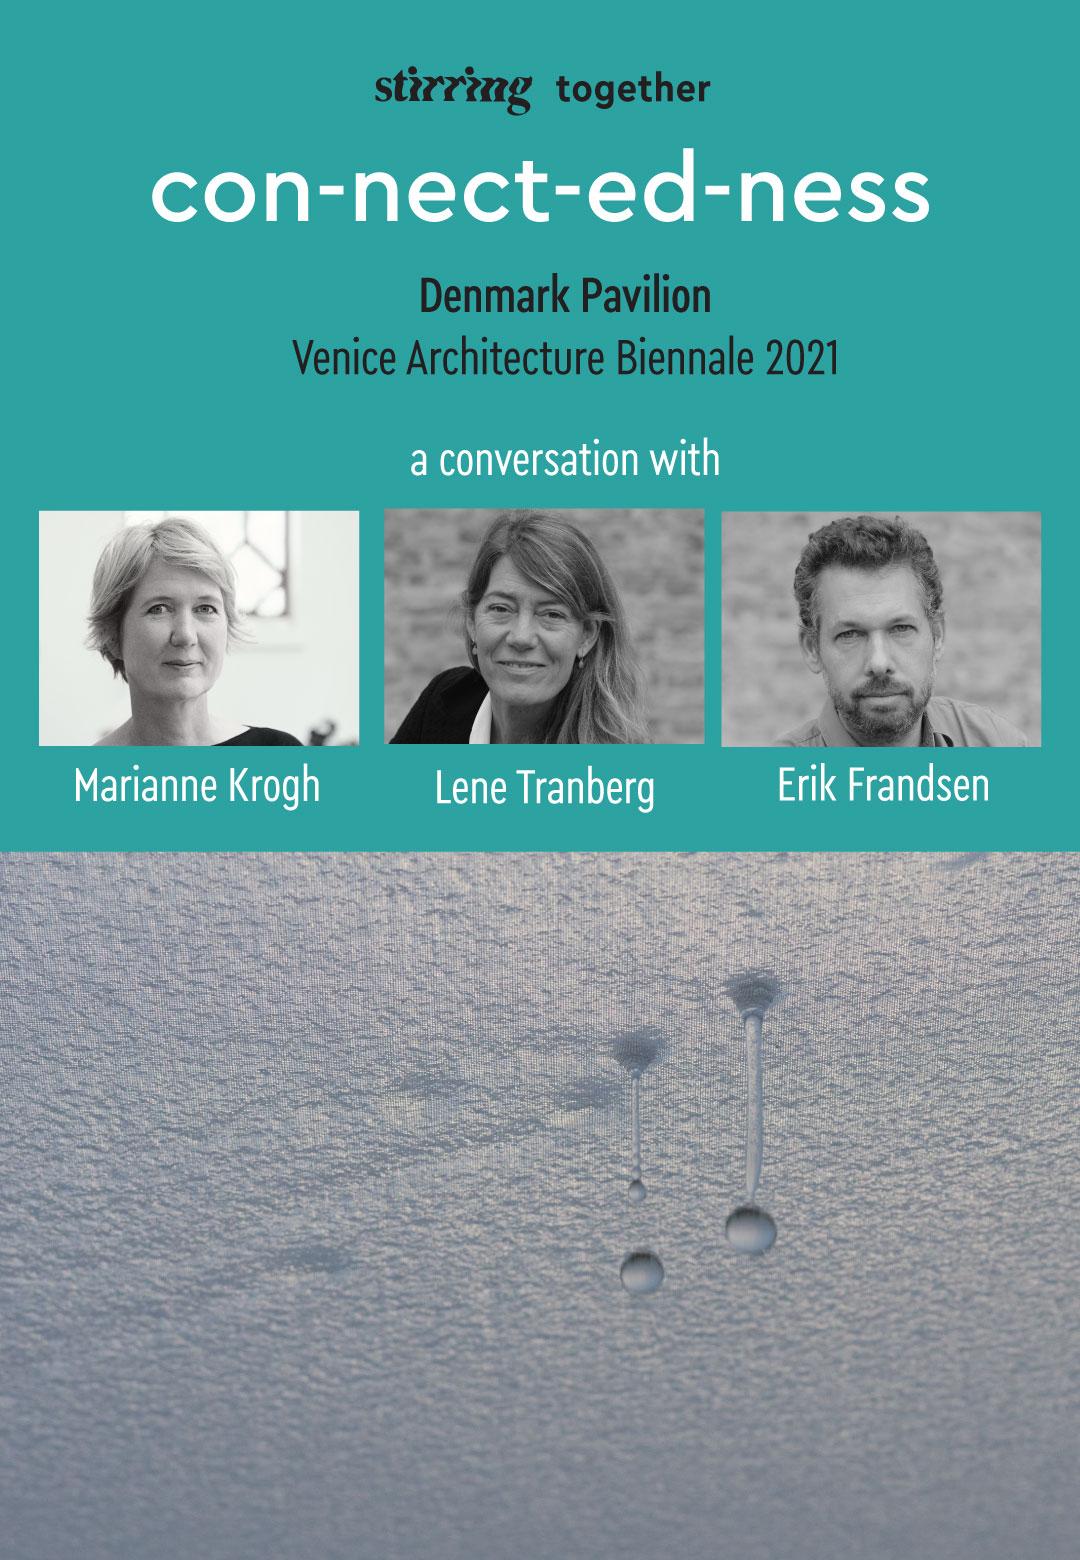 STIRring together with Marianne Krogh, Lene Tranberg, Erik Frandsen | Venice Architecture Biennale 2021 | Danish Pavilion | Marianne Krogh, Lene Tranberg, Erik Frandsen| STIRworld